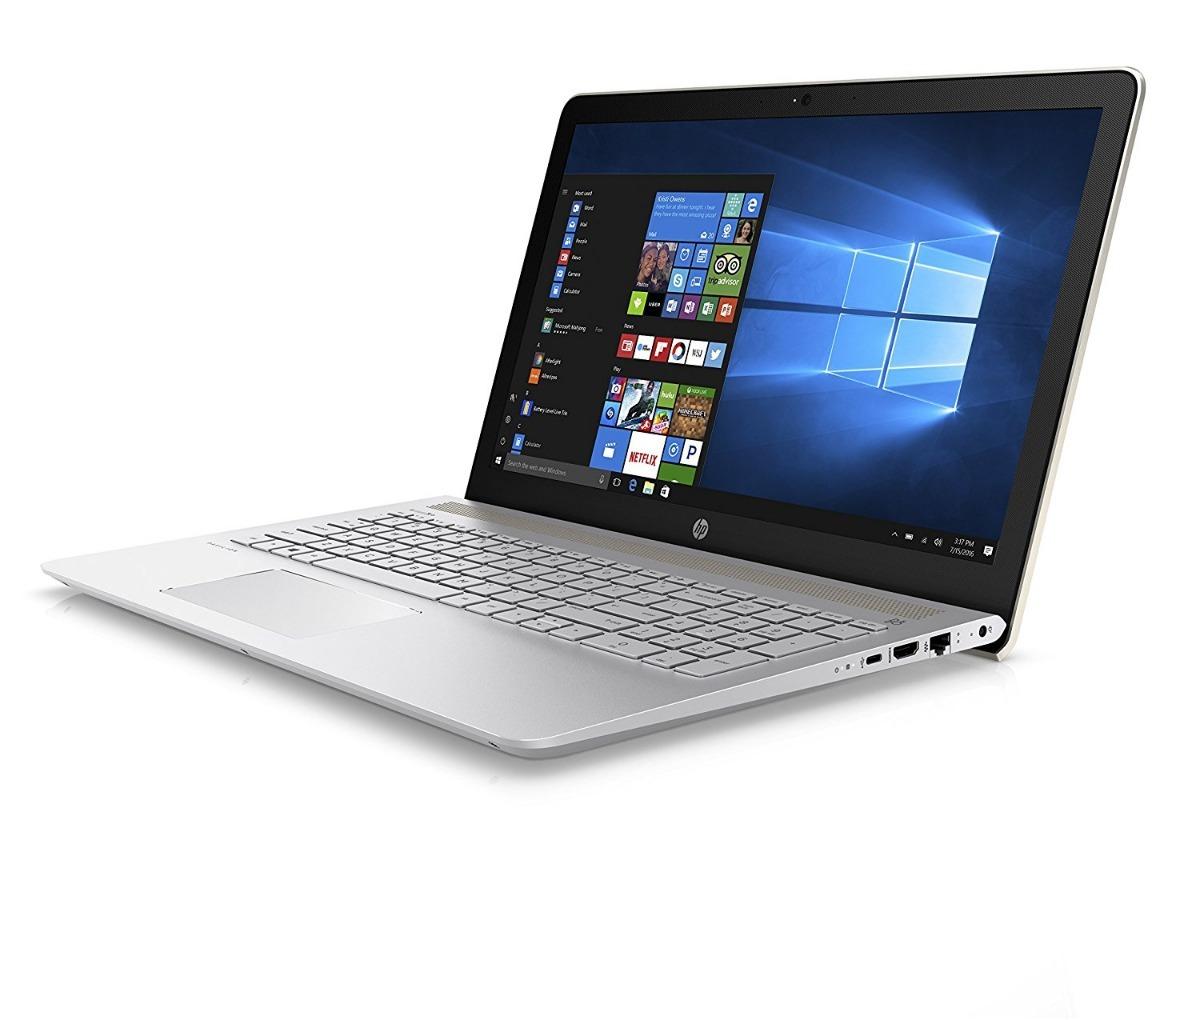 Laptop Hp Pavilion 15 Cc507la Ci7 16gb Ram 1tb Hdd 128gb